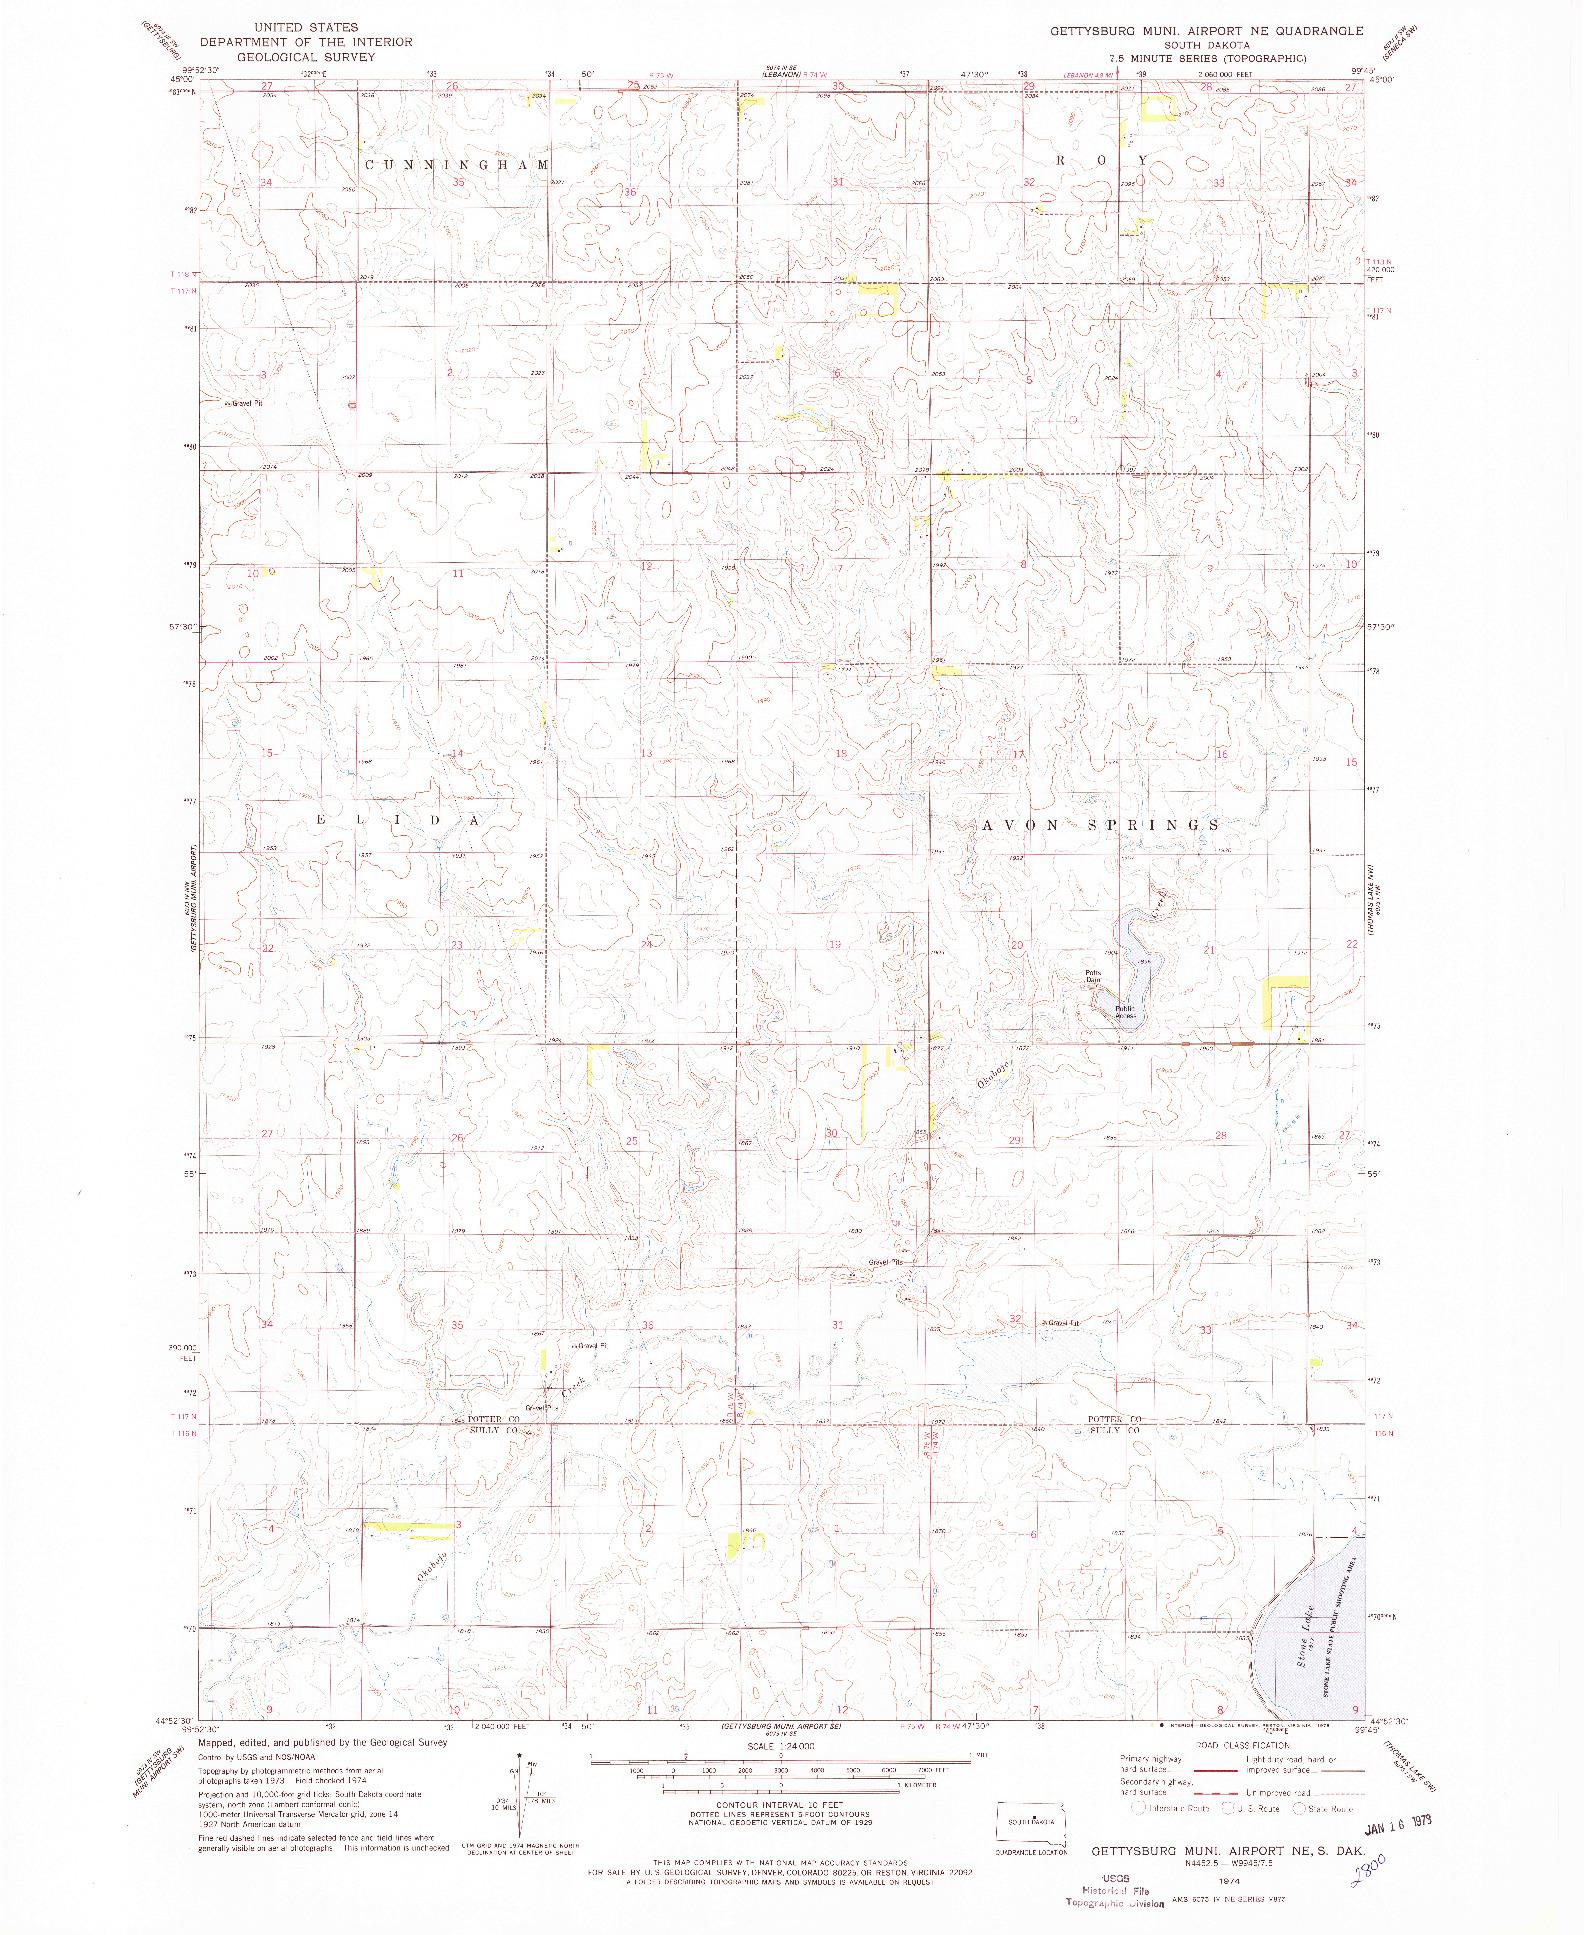 USGS 1:24000-SCALE QUADRANGLE FOR GETTYSBURG MUNI. AIRPORT NE, SD 1974